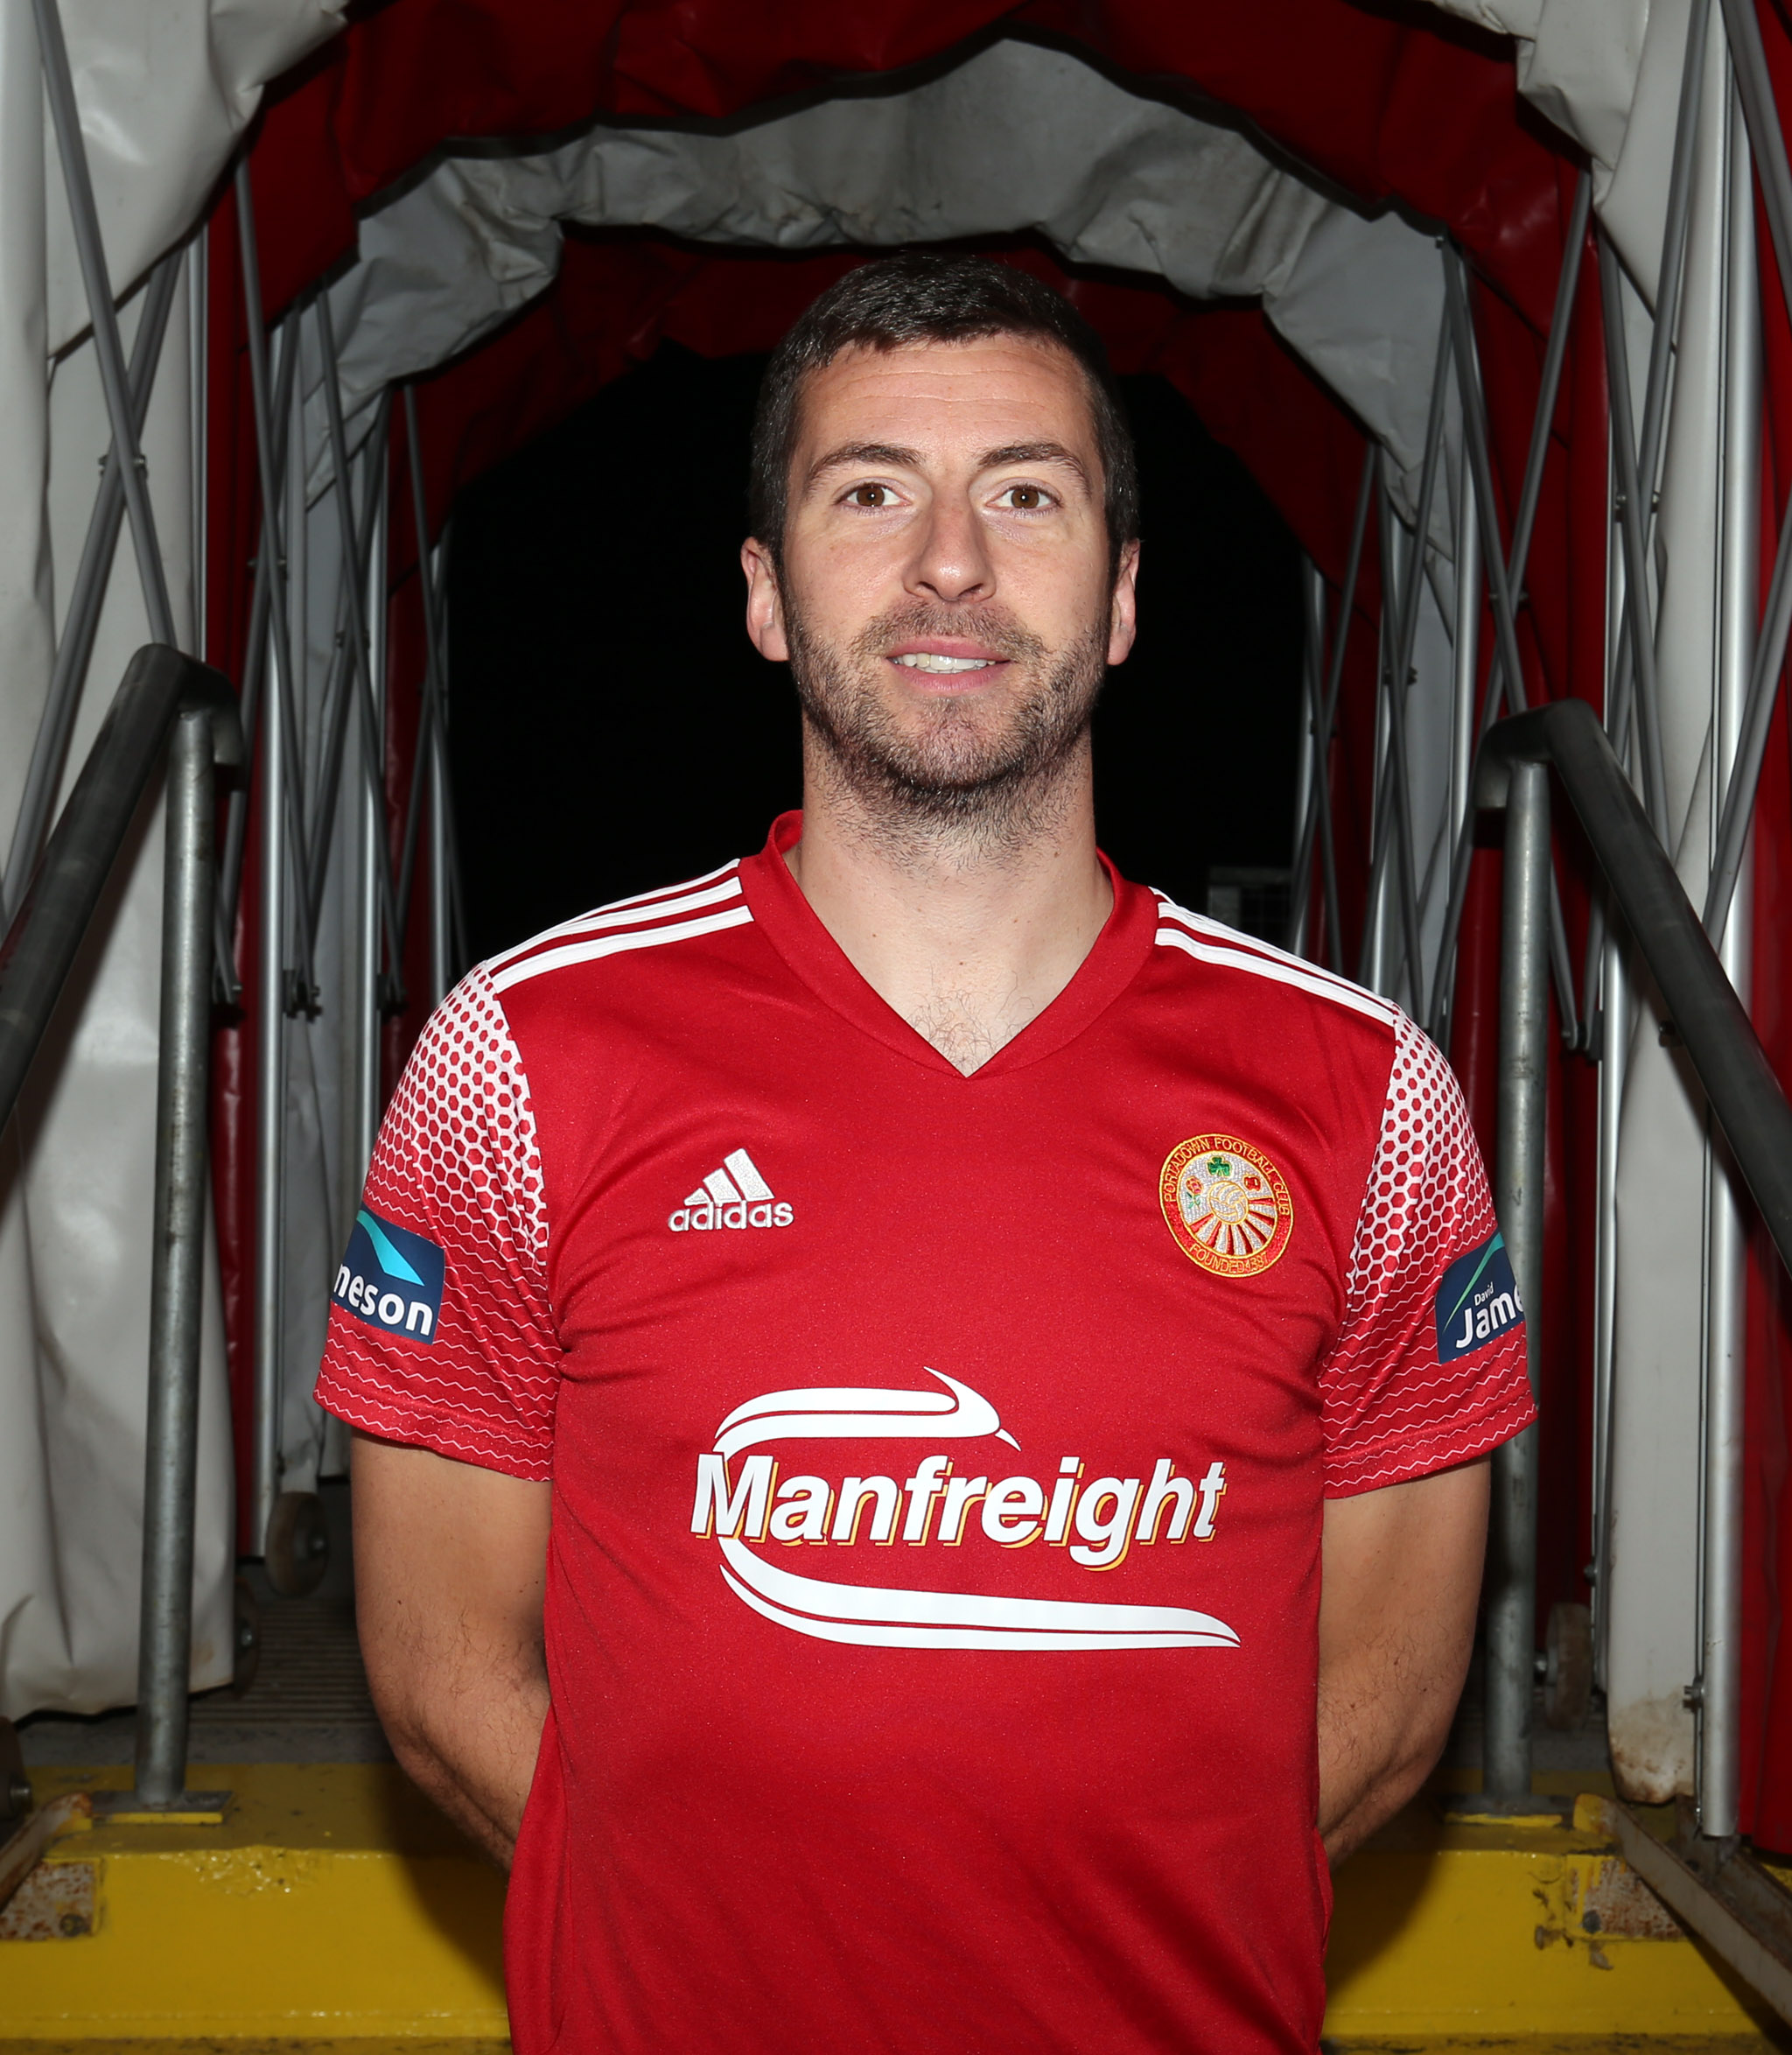 Stephen Murray - Portadown Football Club